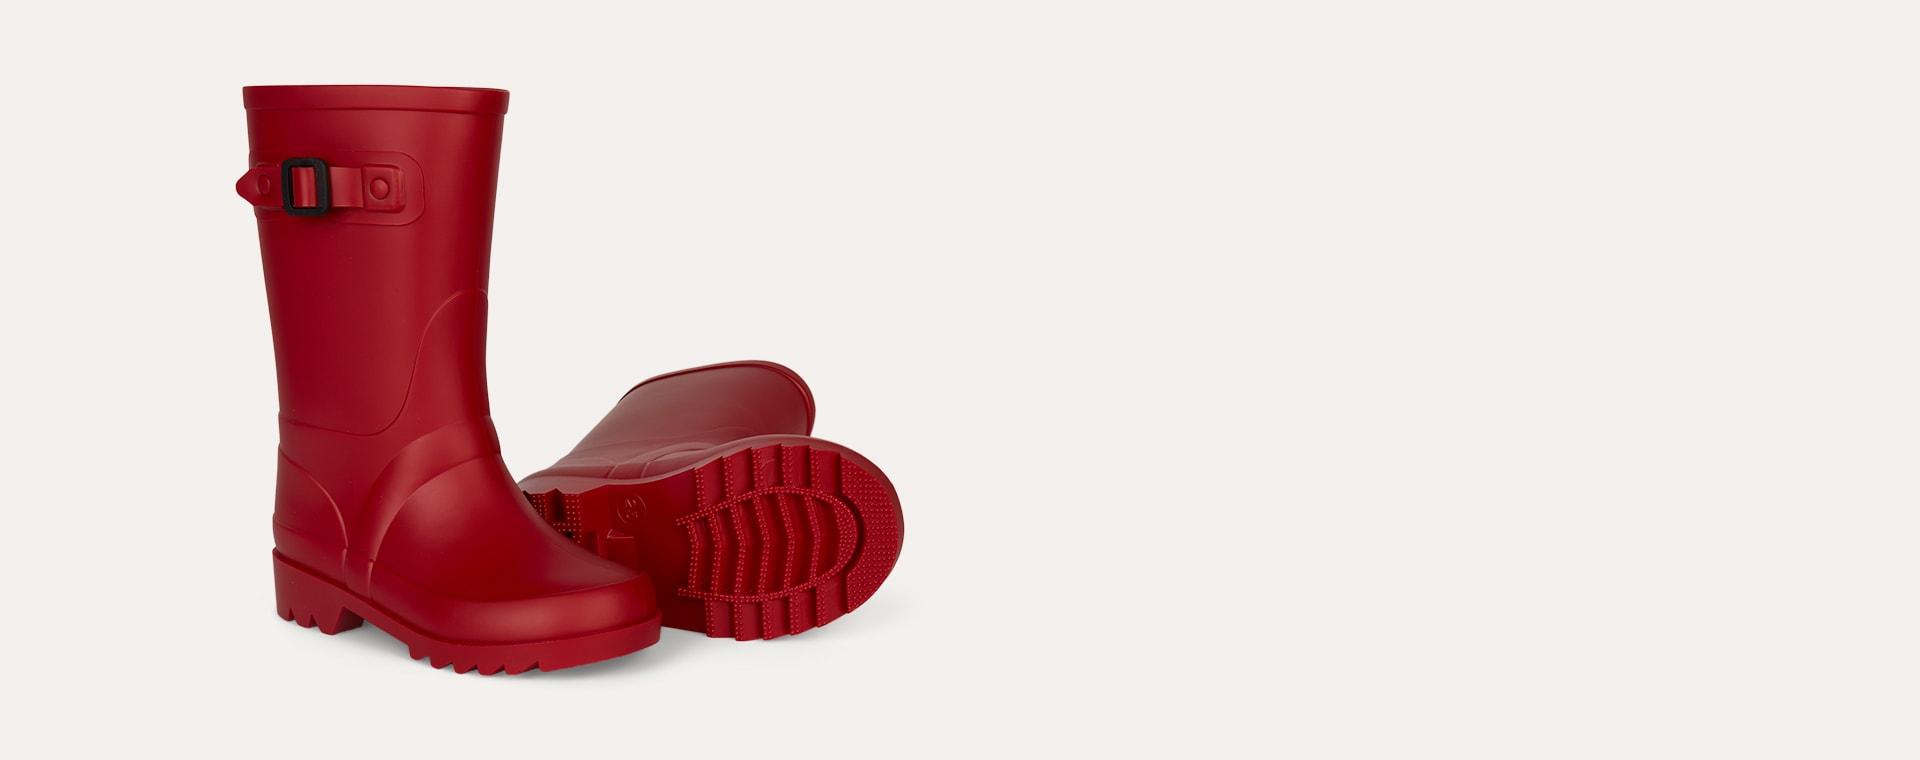 Rojo igor Pitter Wellies